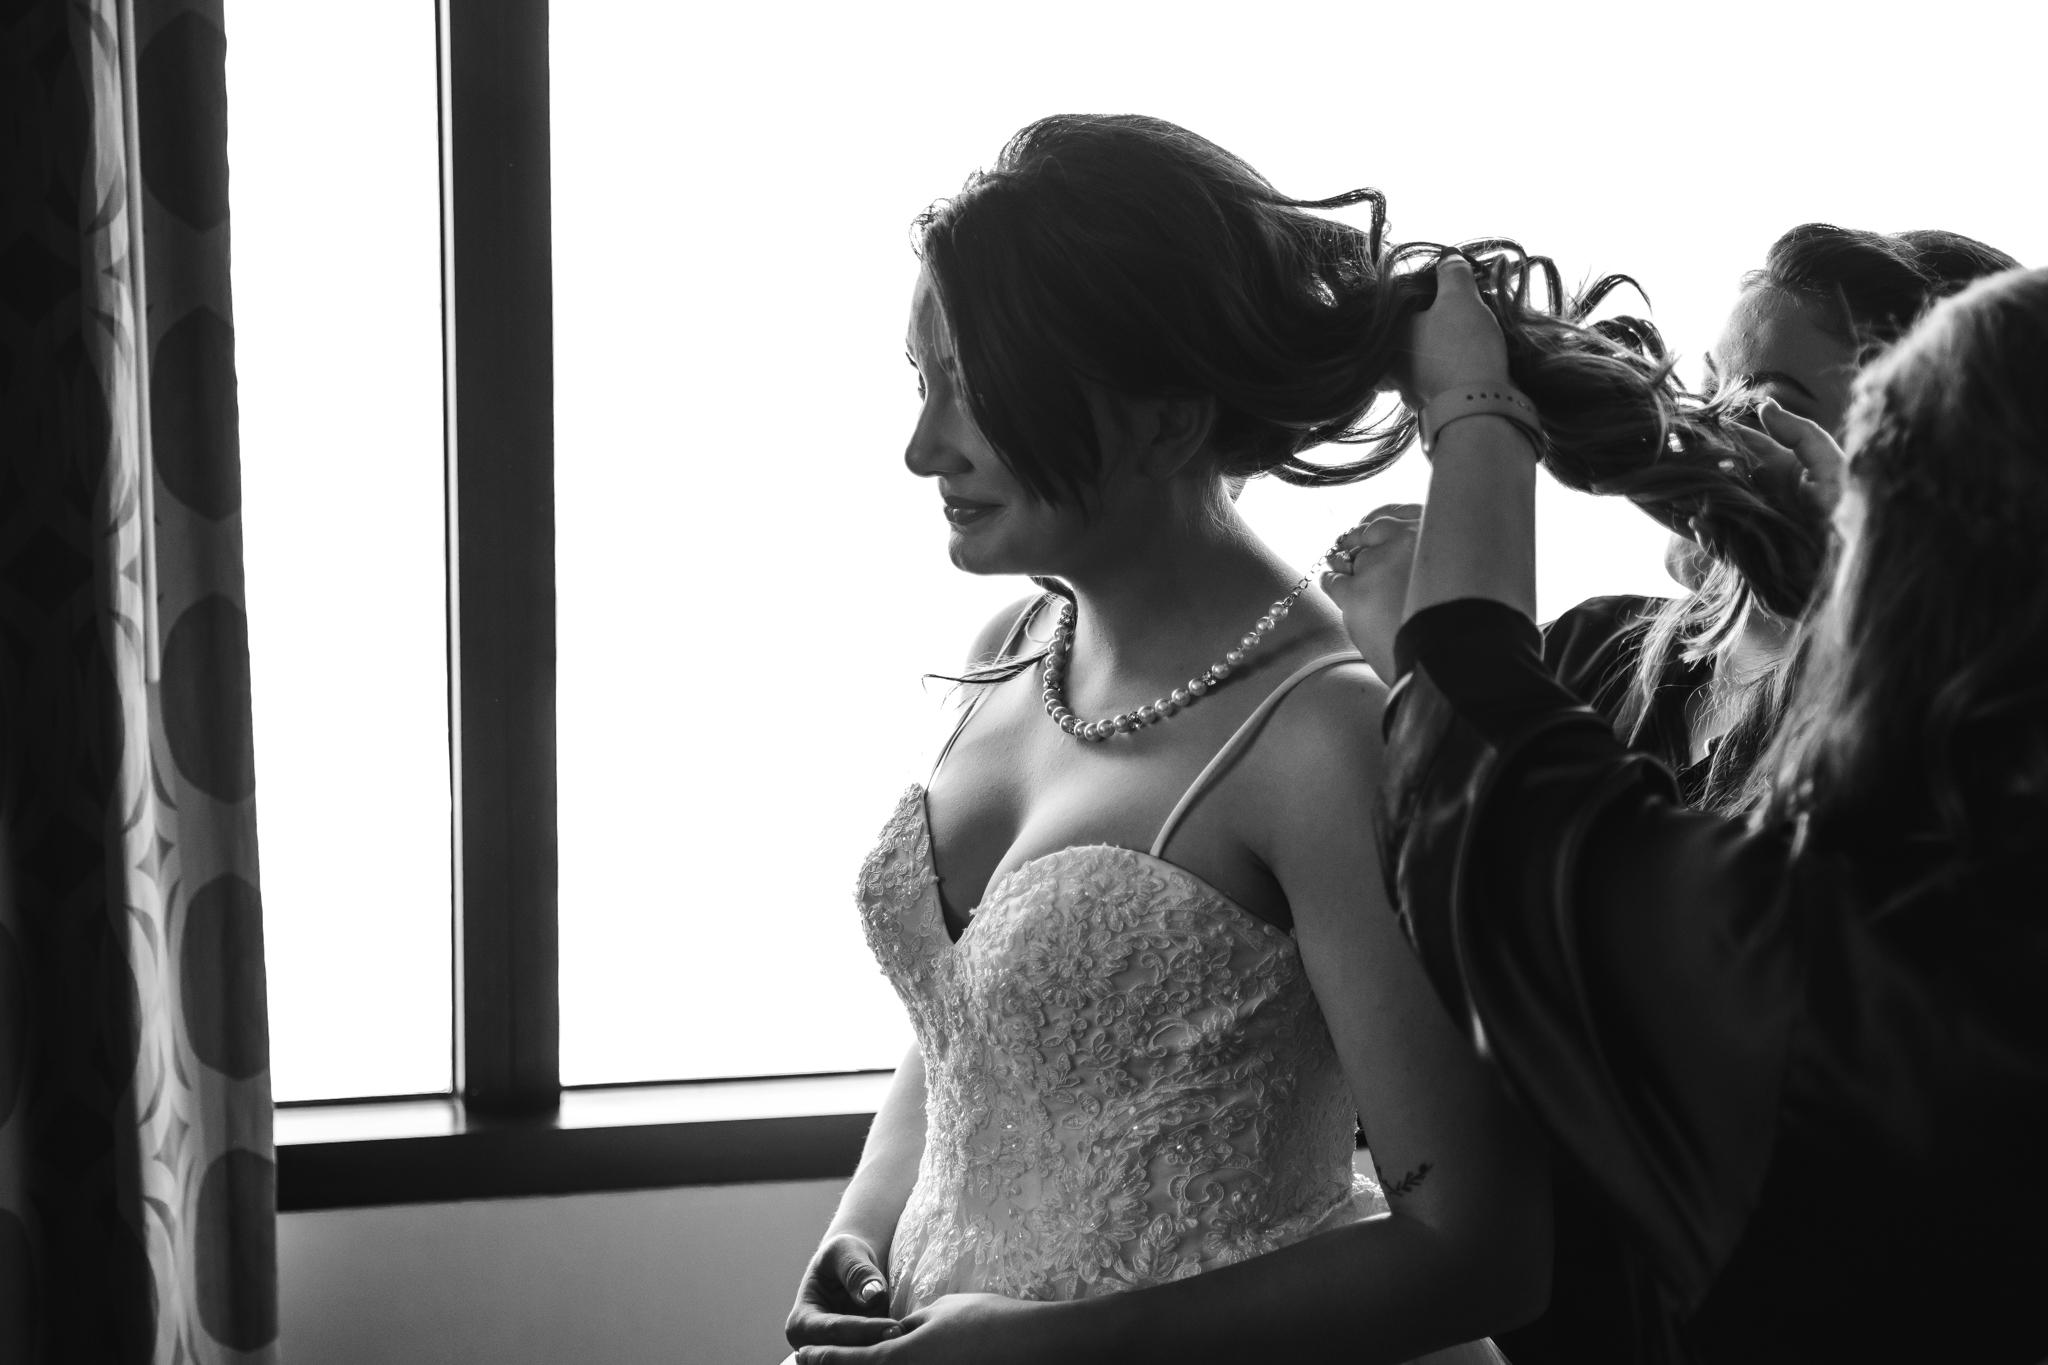 memphis-wedding-photographers-thewarmtharoundyou-ballinese-ballroom (36 of 232).jpg